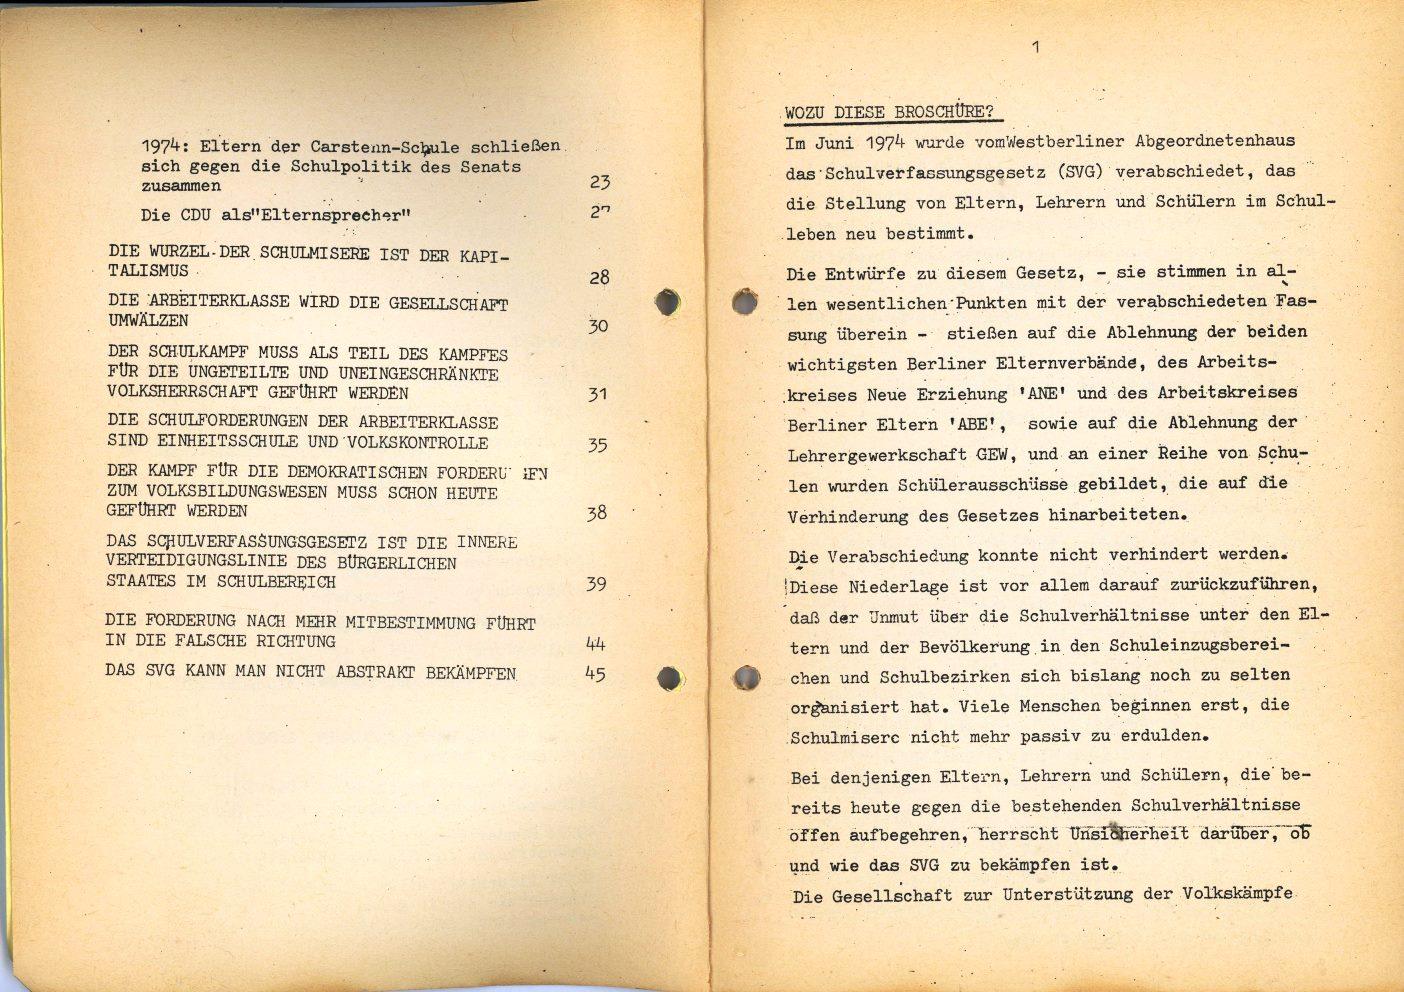 Berlin_SMV_GUV_1974_Schulmisere_03